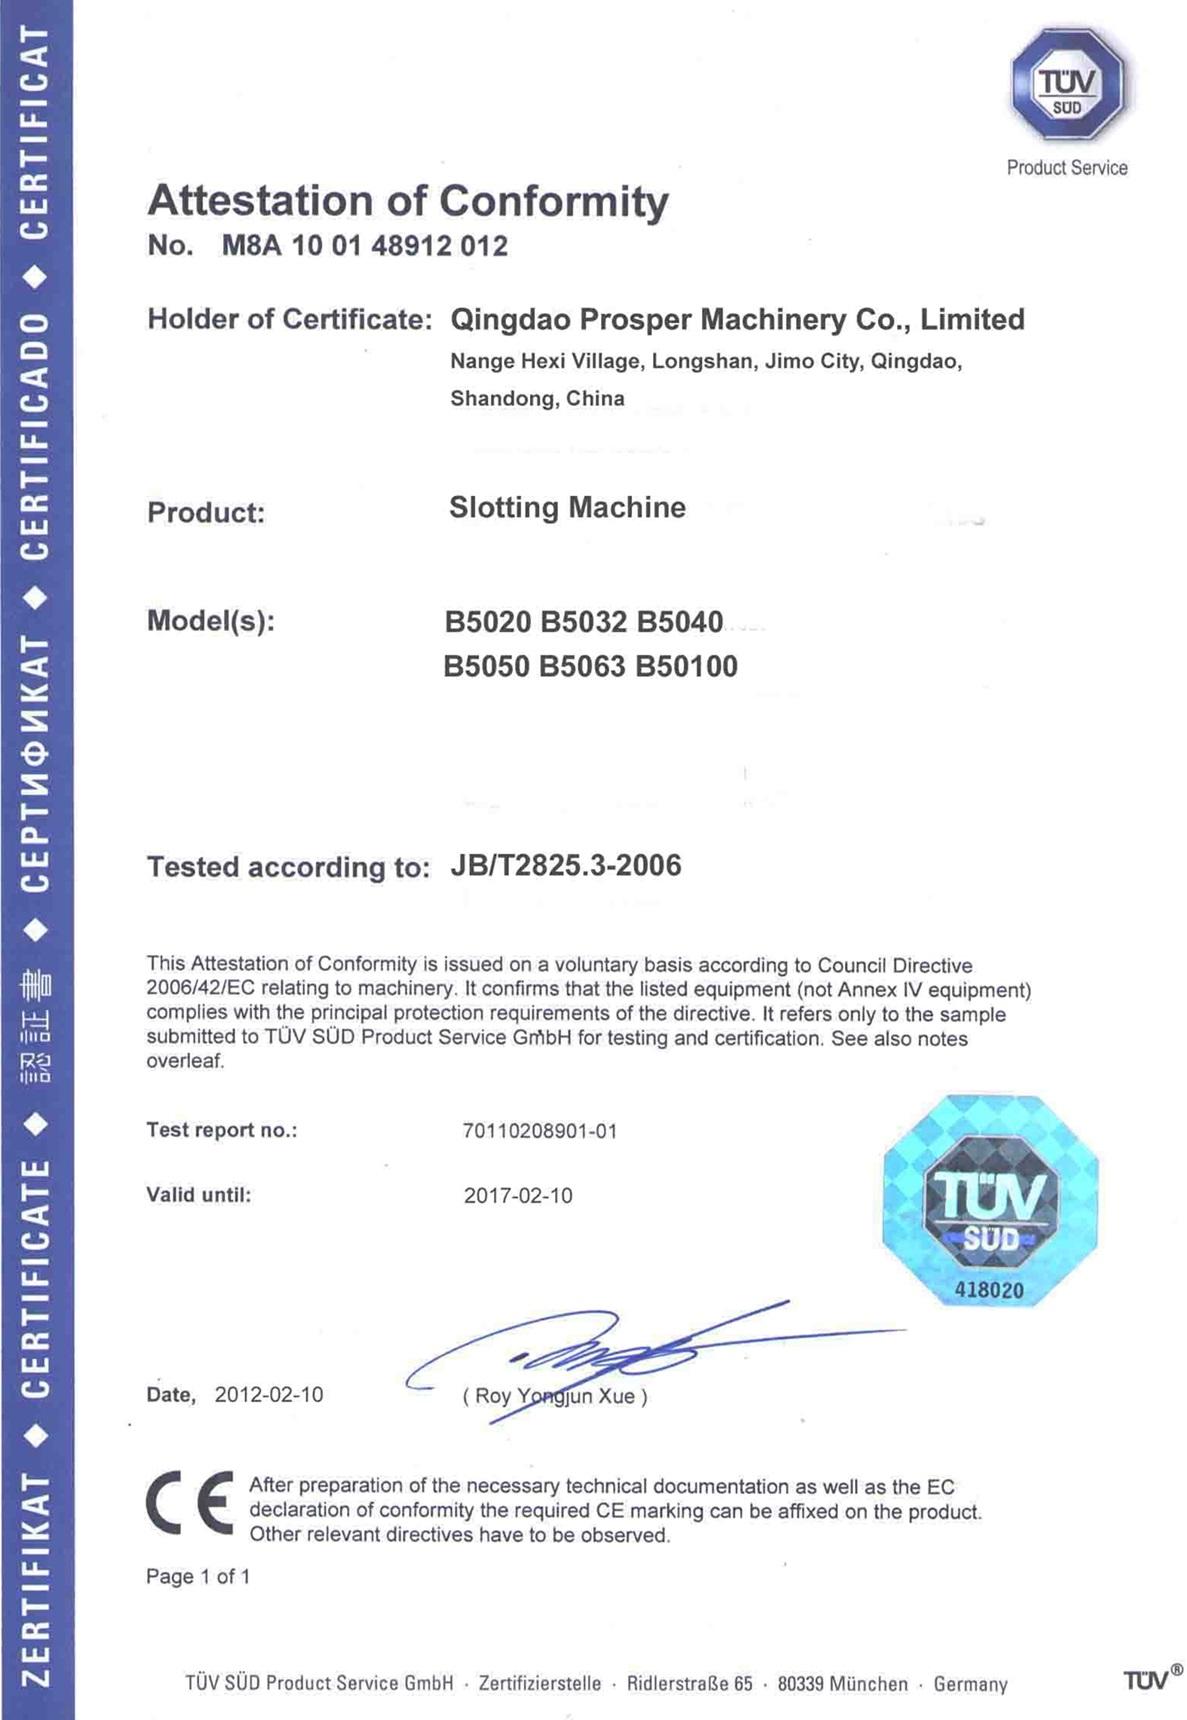 CE for Slotting Machine